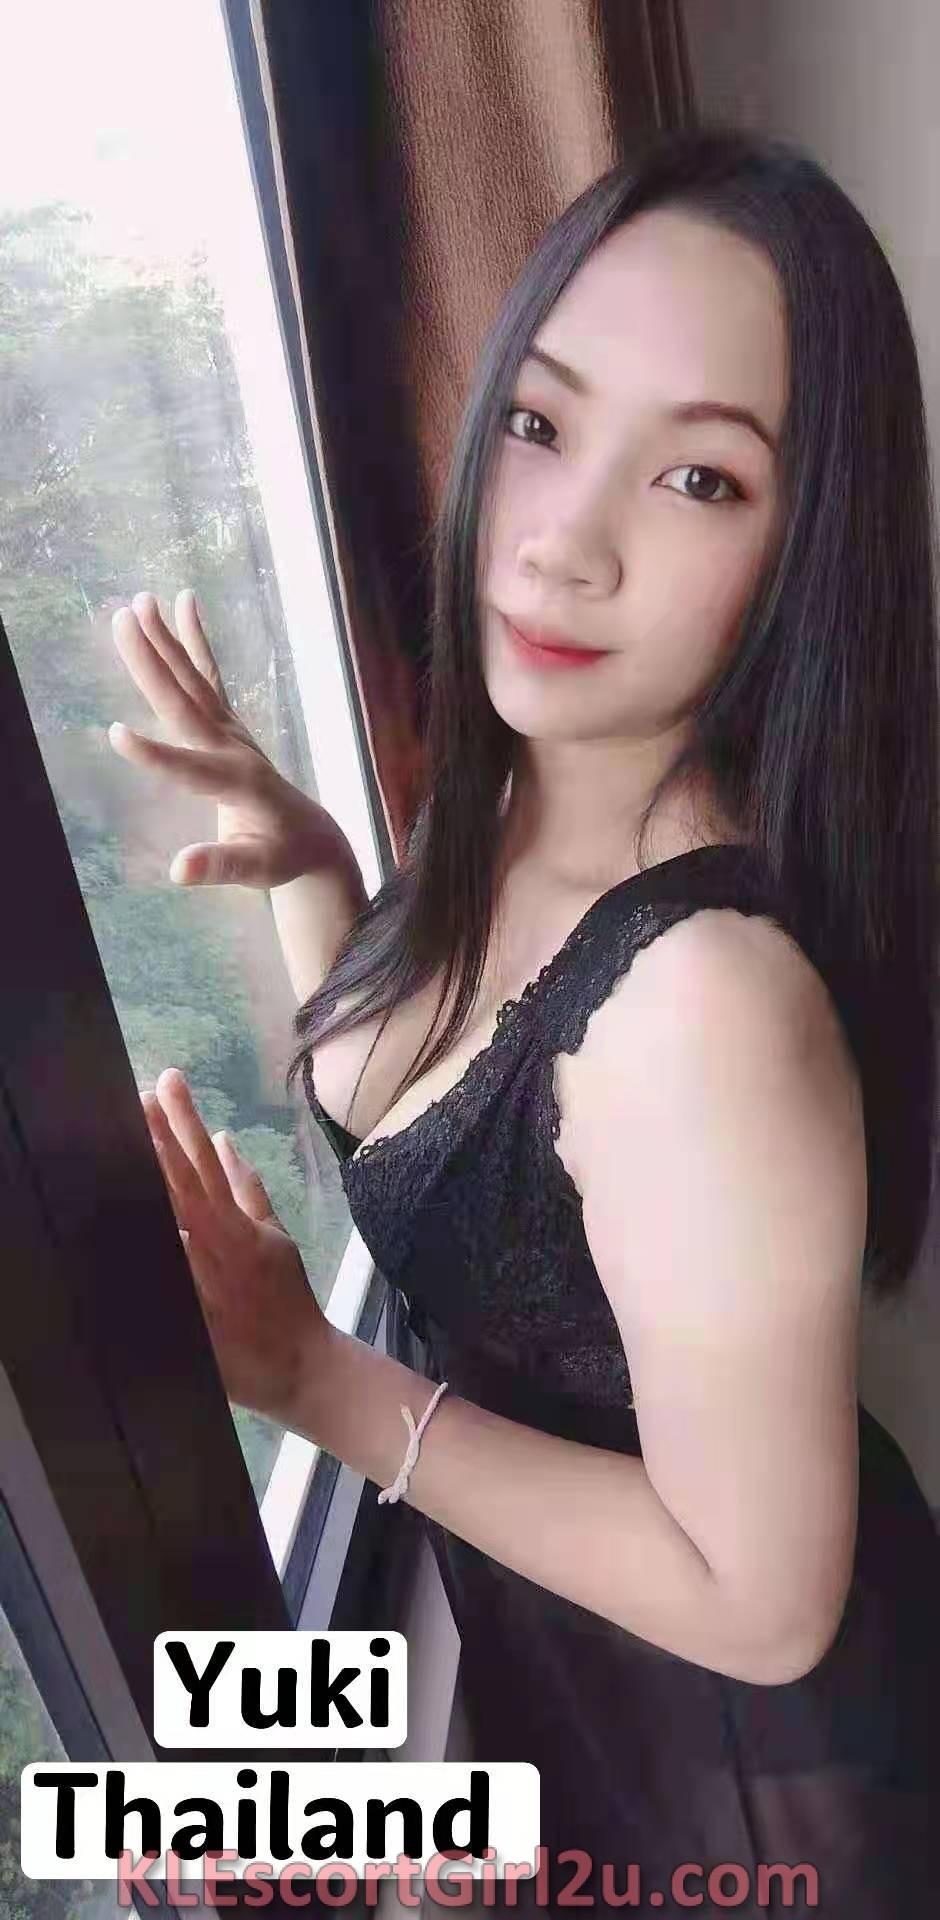 Kl Escort High Gf Feel Thai - Yuki